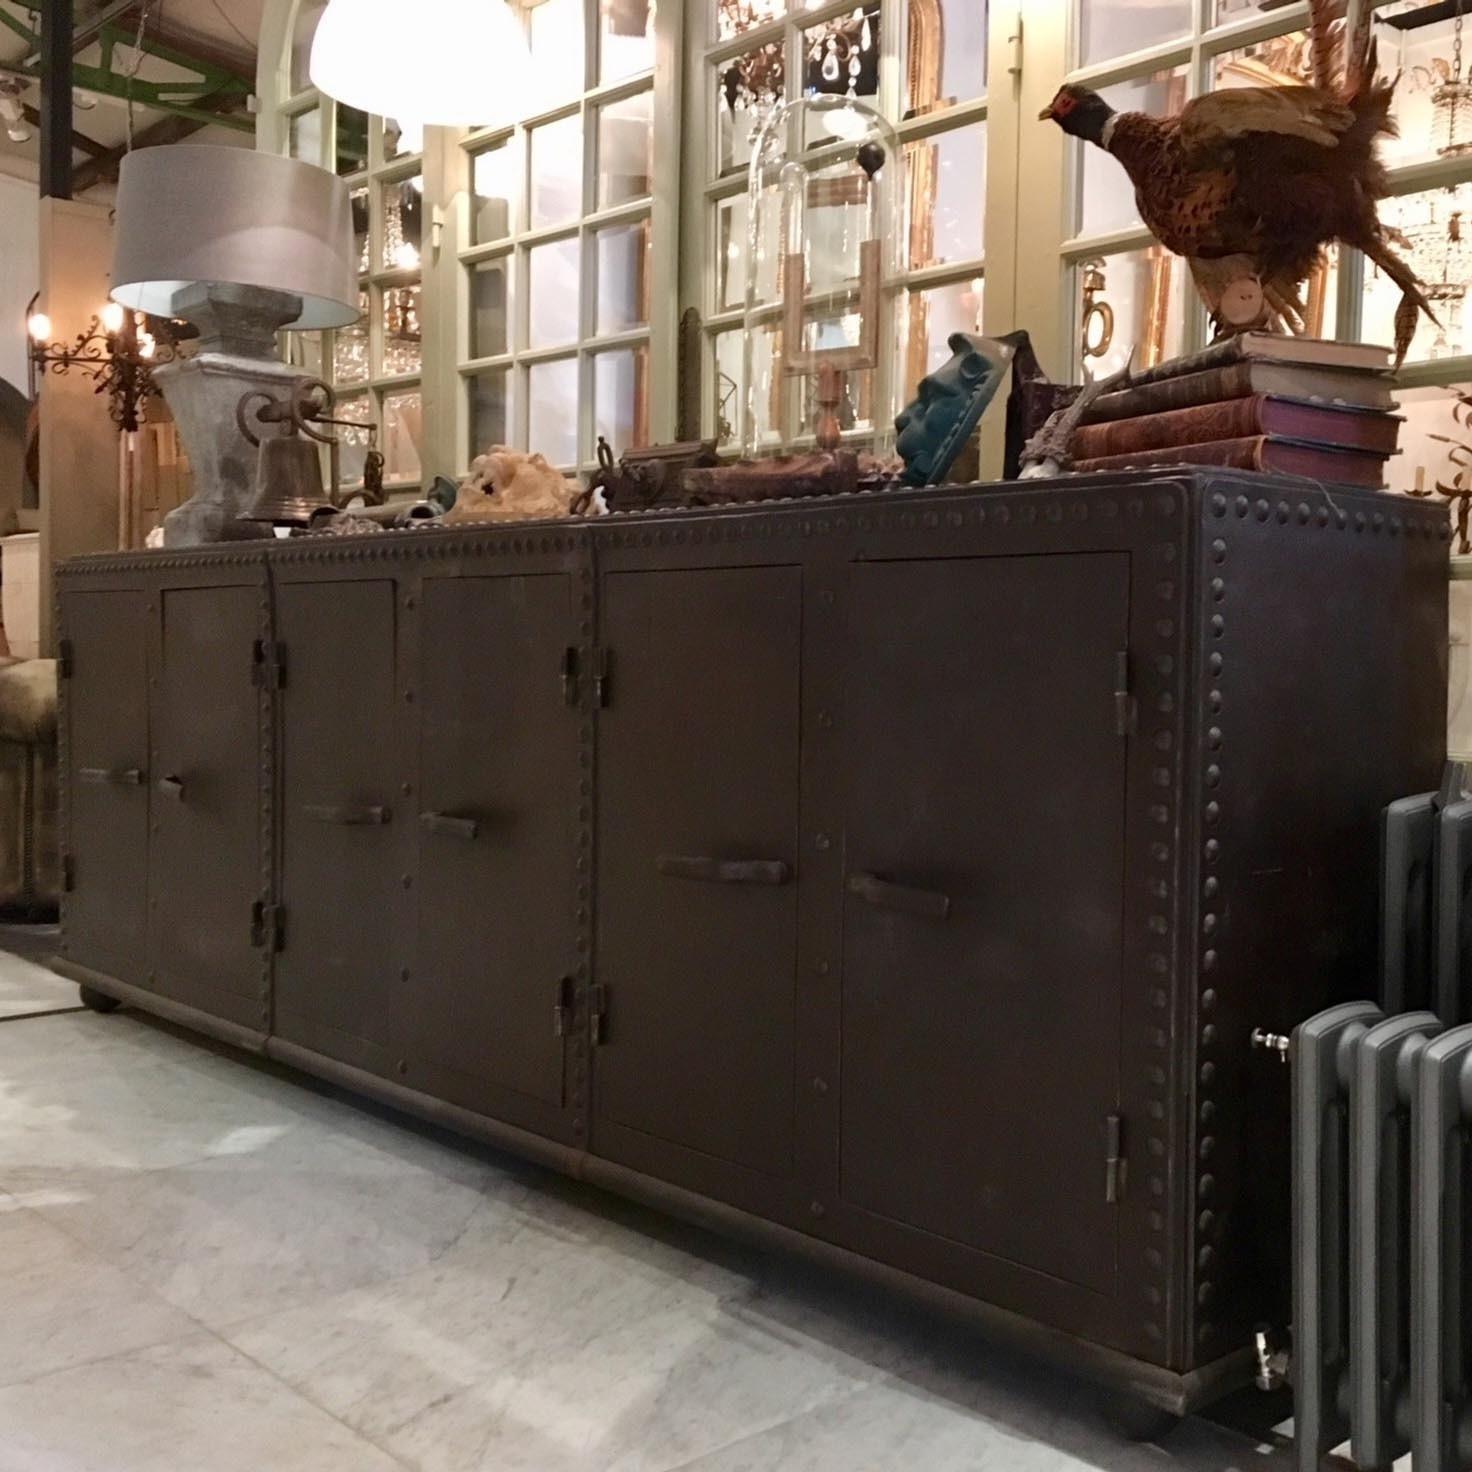 Groot dressoir gemaakt van oude industriële watertanks